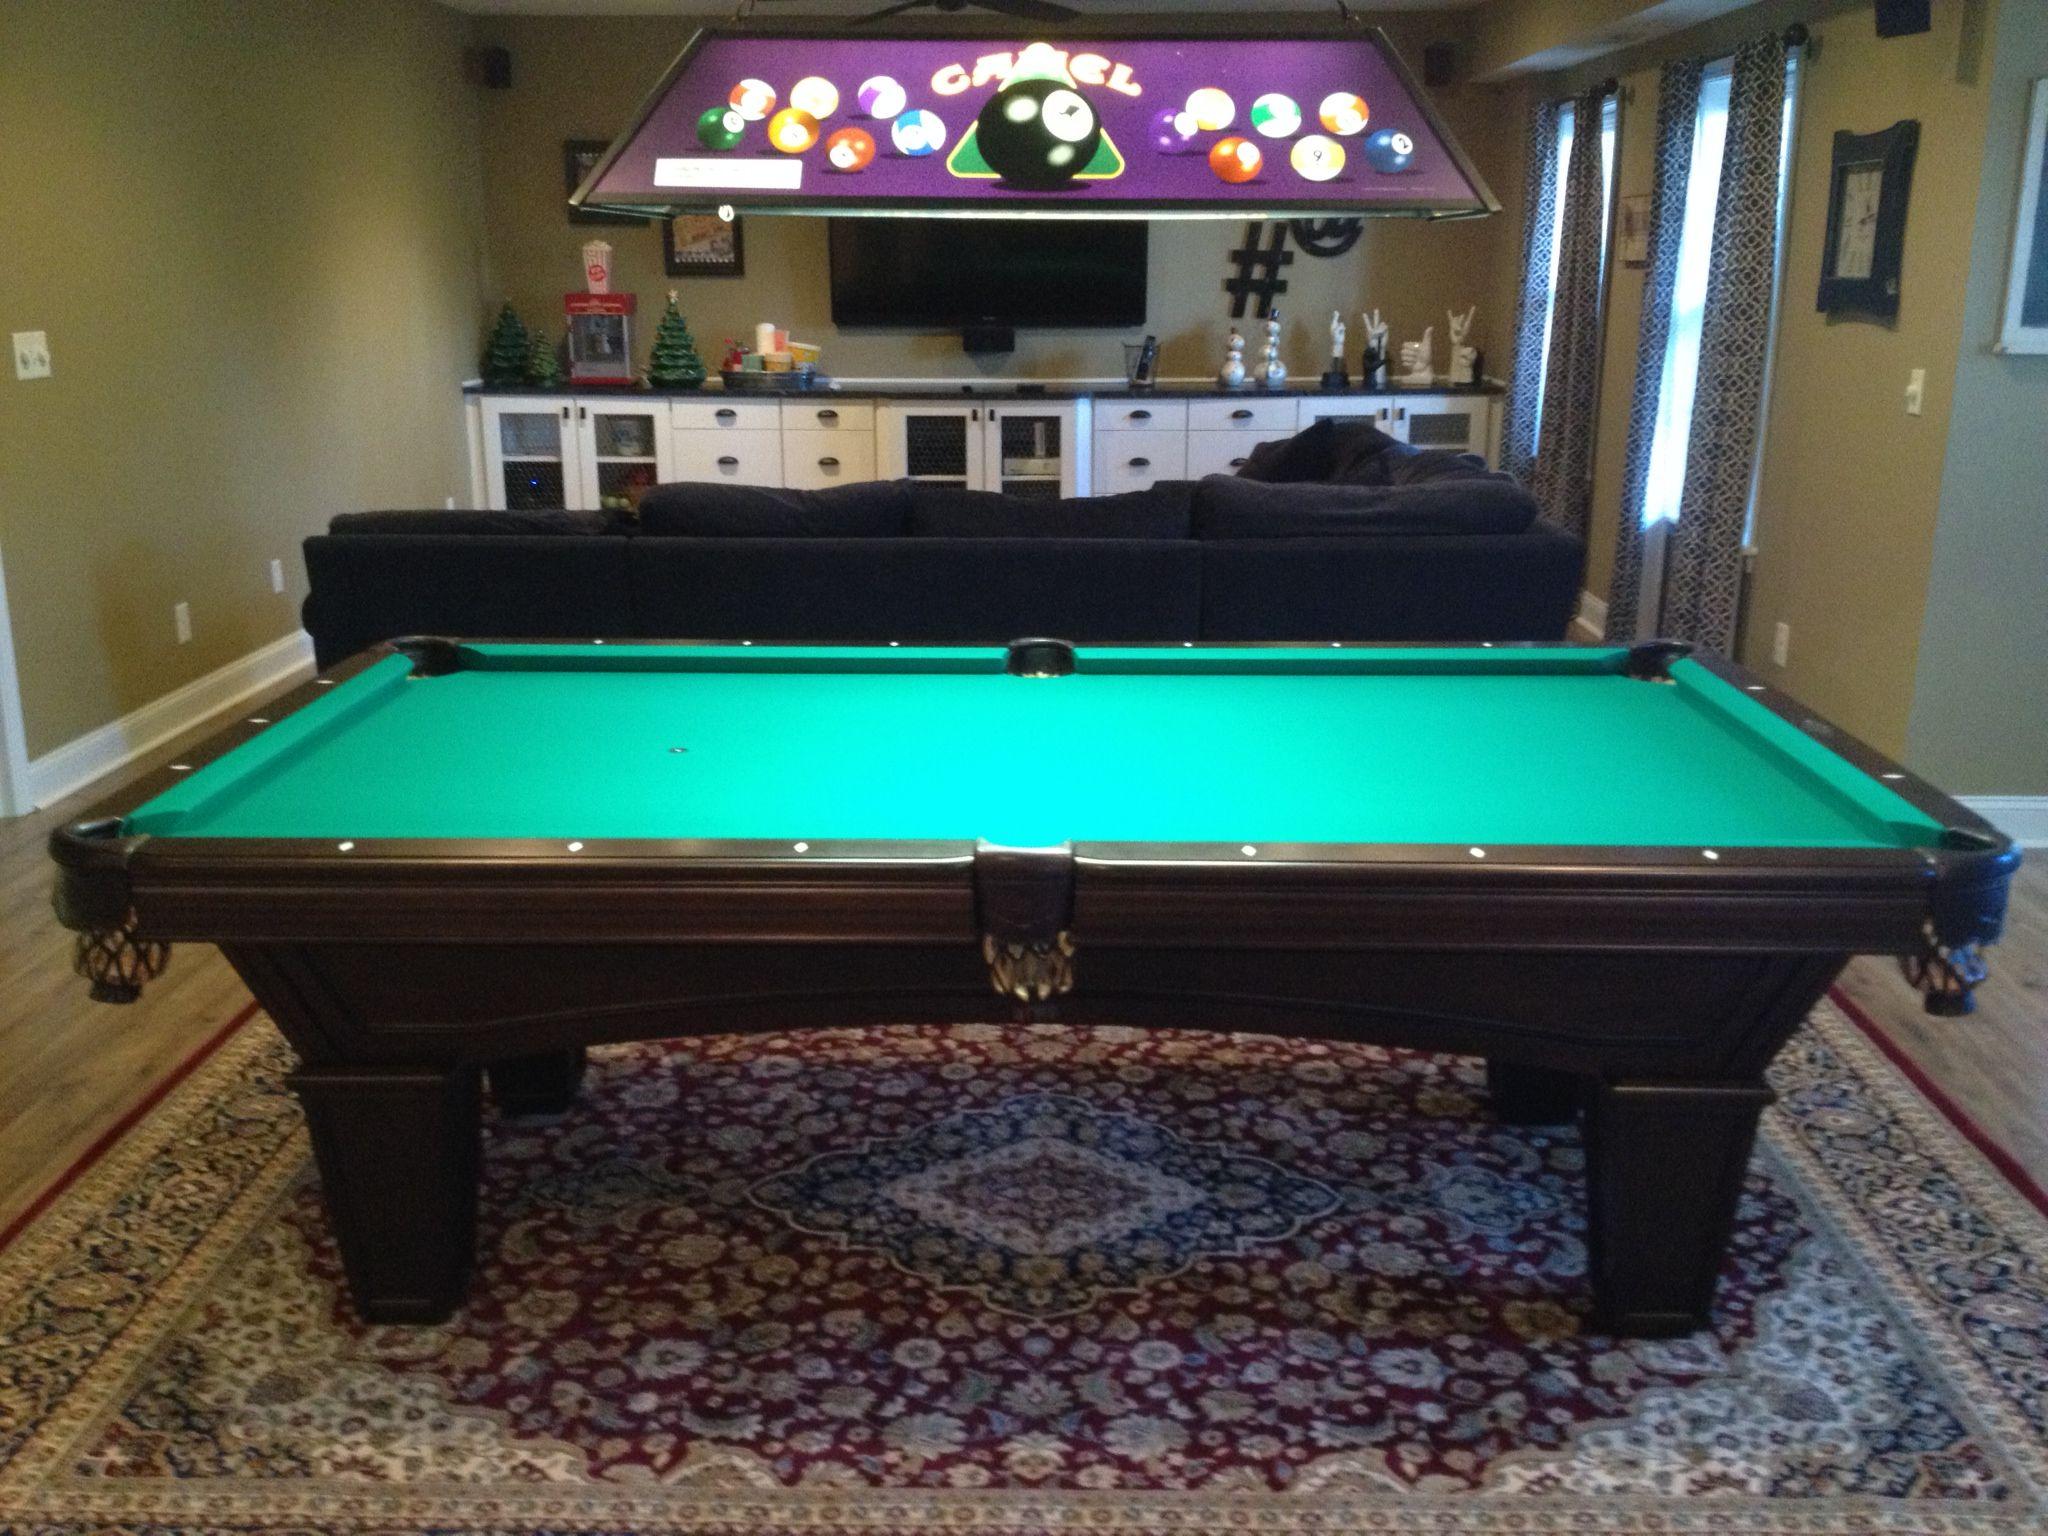 Brunswick Glenwood With Tapered Legs Pool Table Installed By - Brunswick glenwood pool table